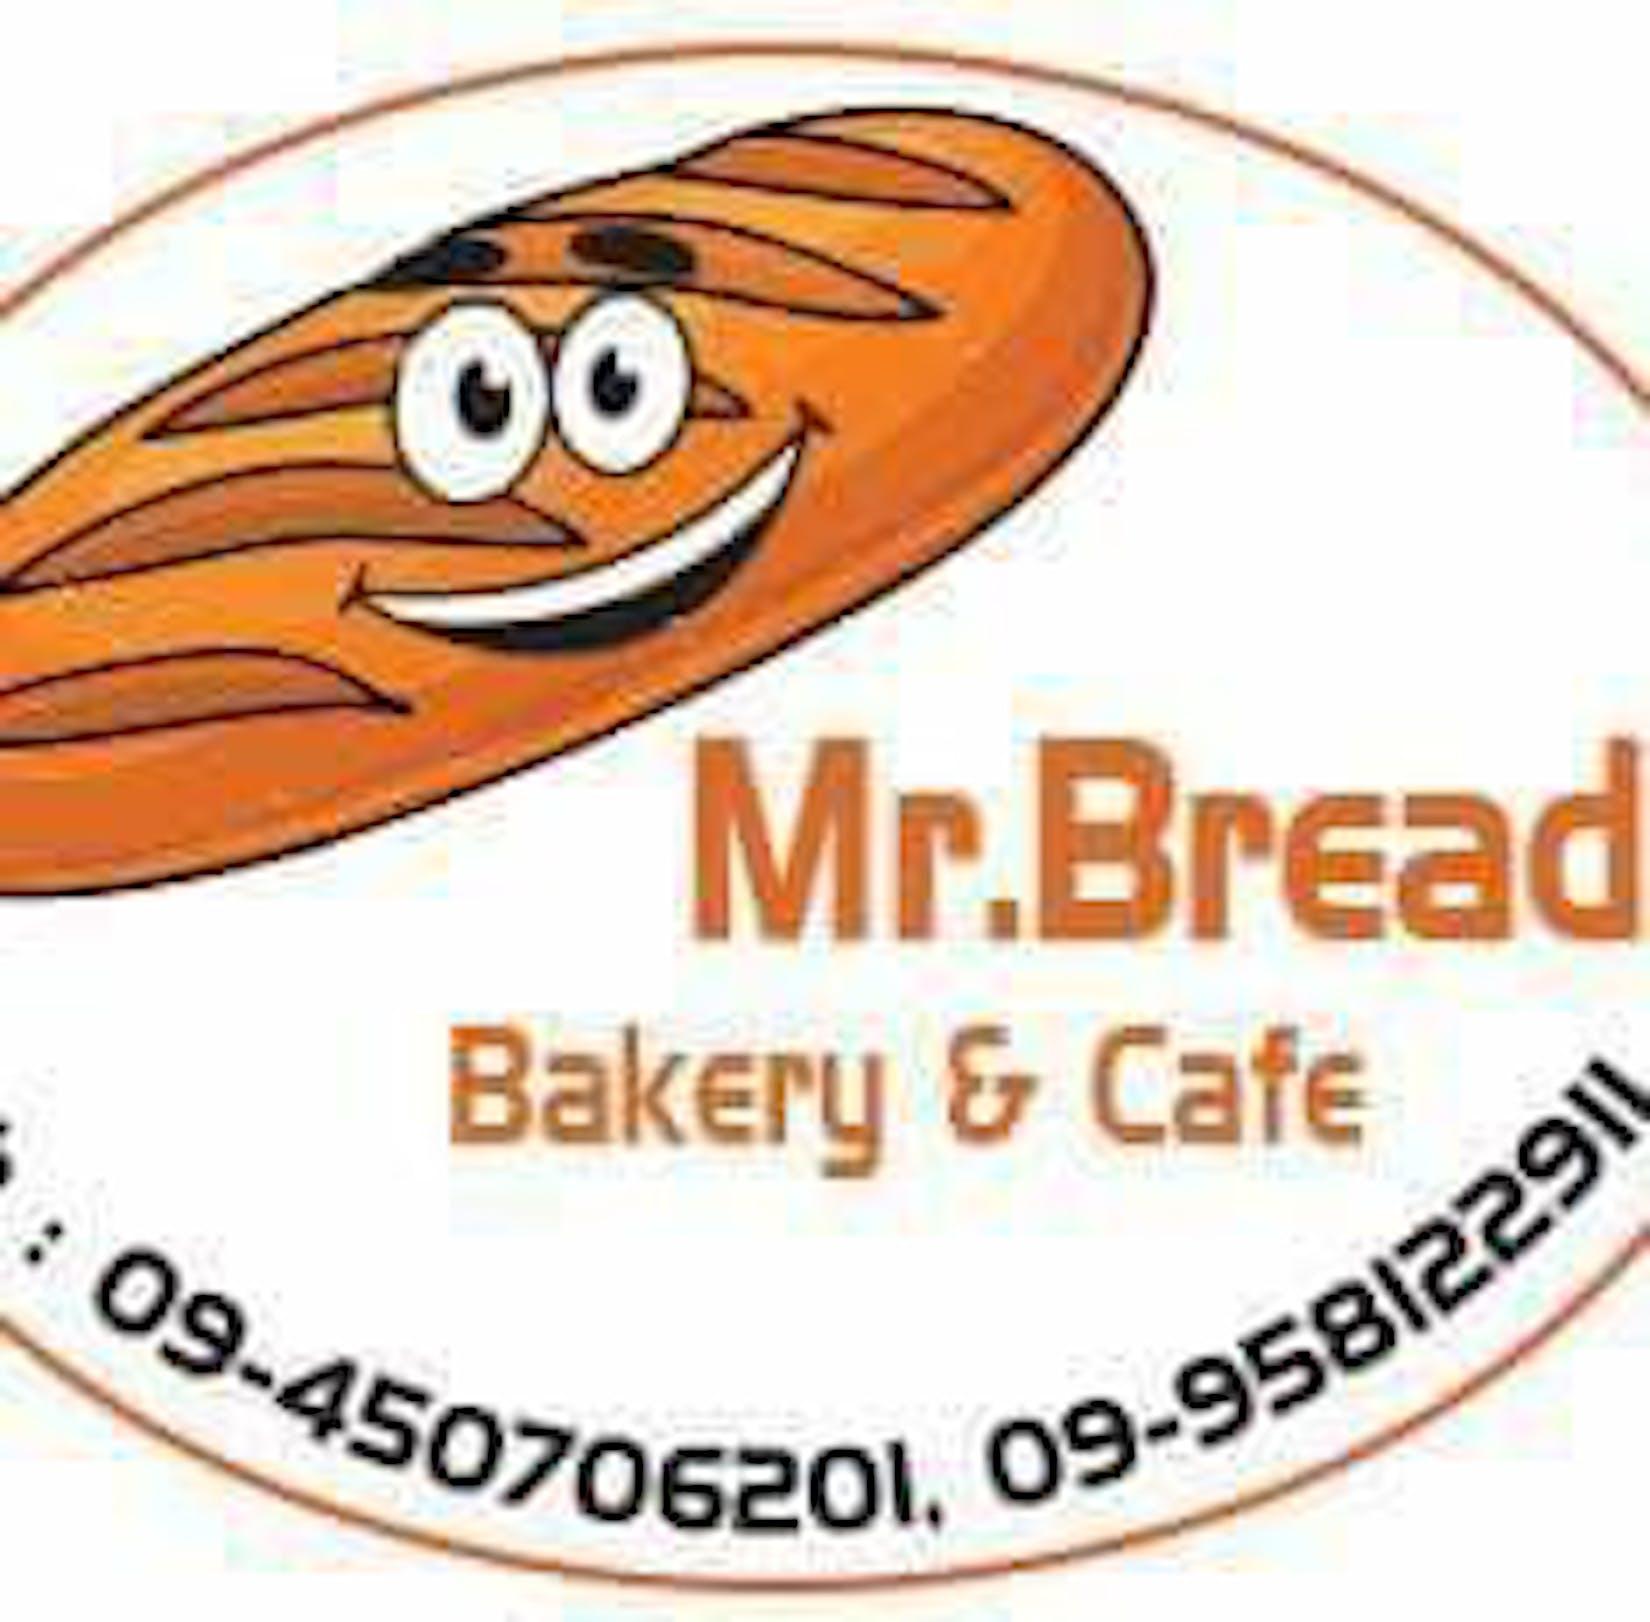 Mr. Bread Bakery & Cafe | yathar